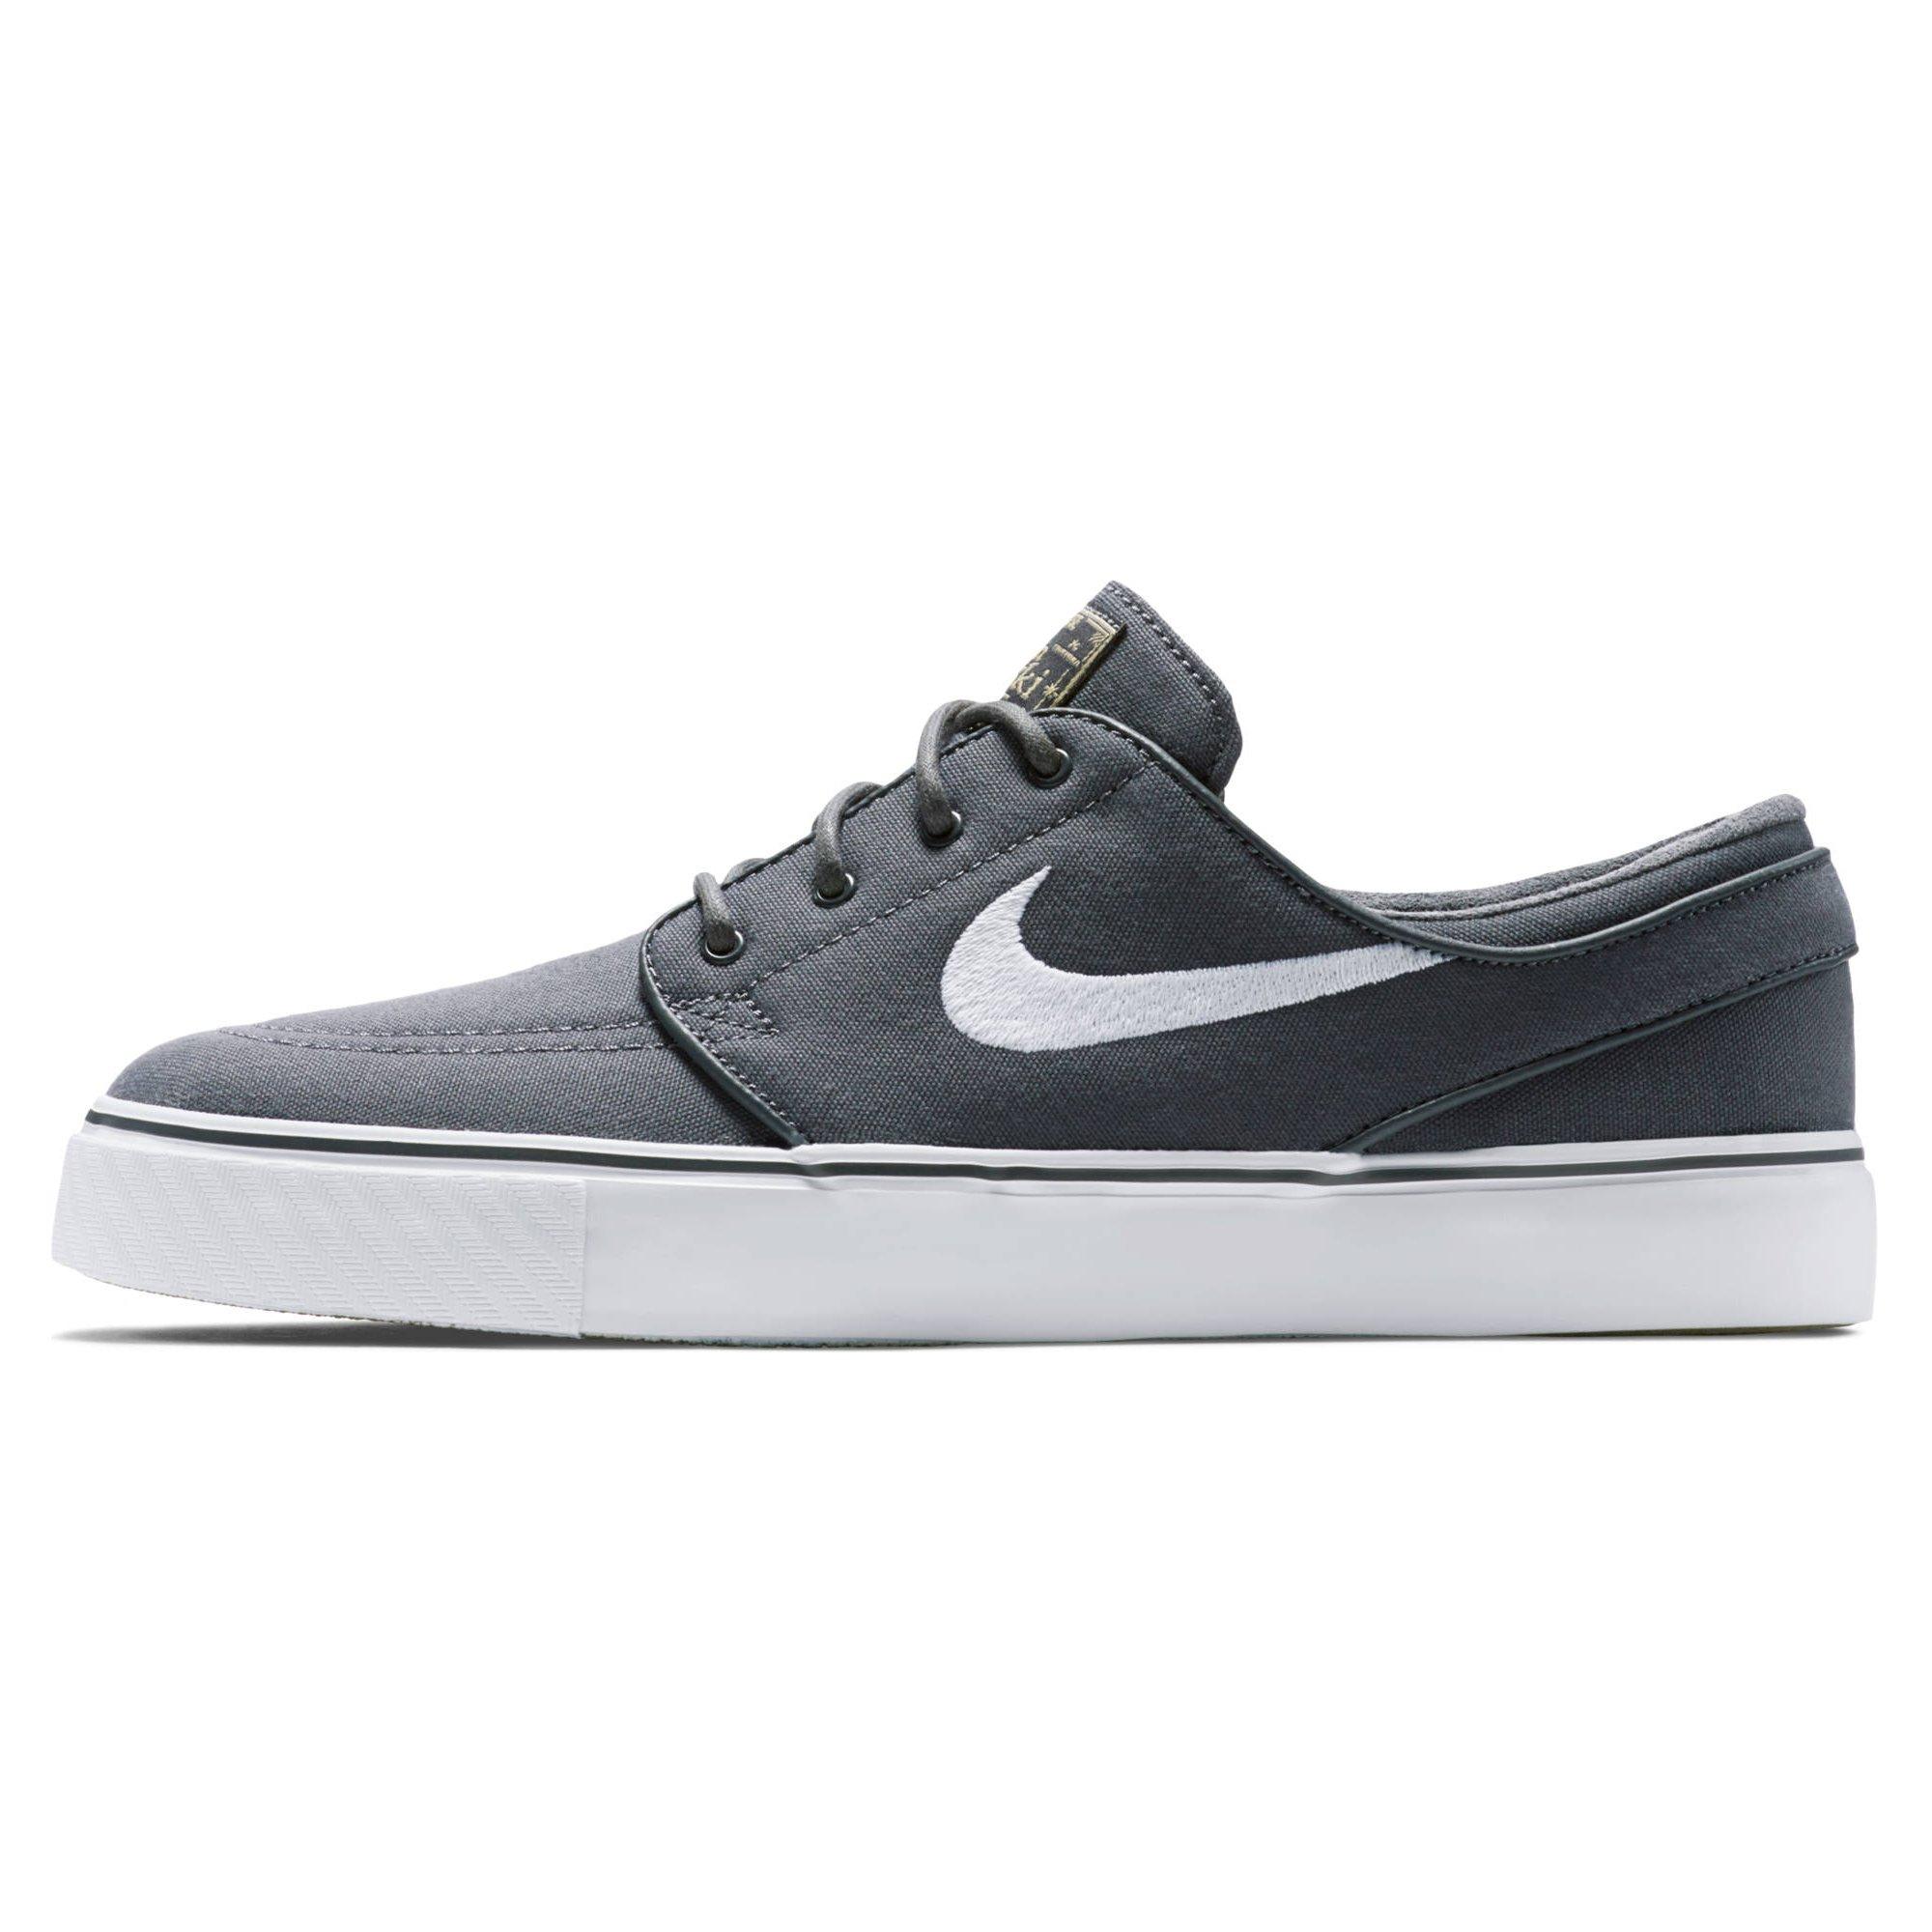 new arrival 7a5d3 b47c0 Galleon - Nike Mens Zoom Stefan Janoski L Skate Shoe (6 D(M) US, Drk Gry  White Gm Lght Brwn Mtl)